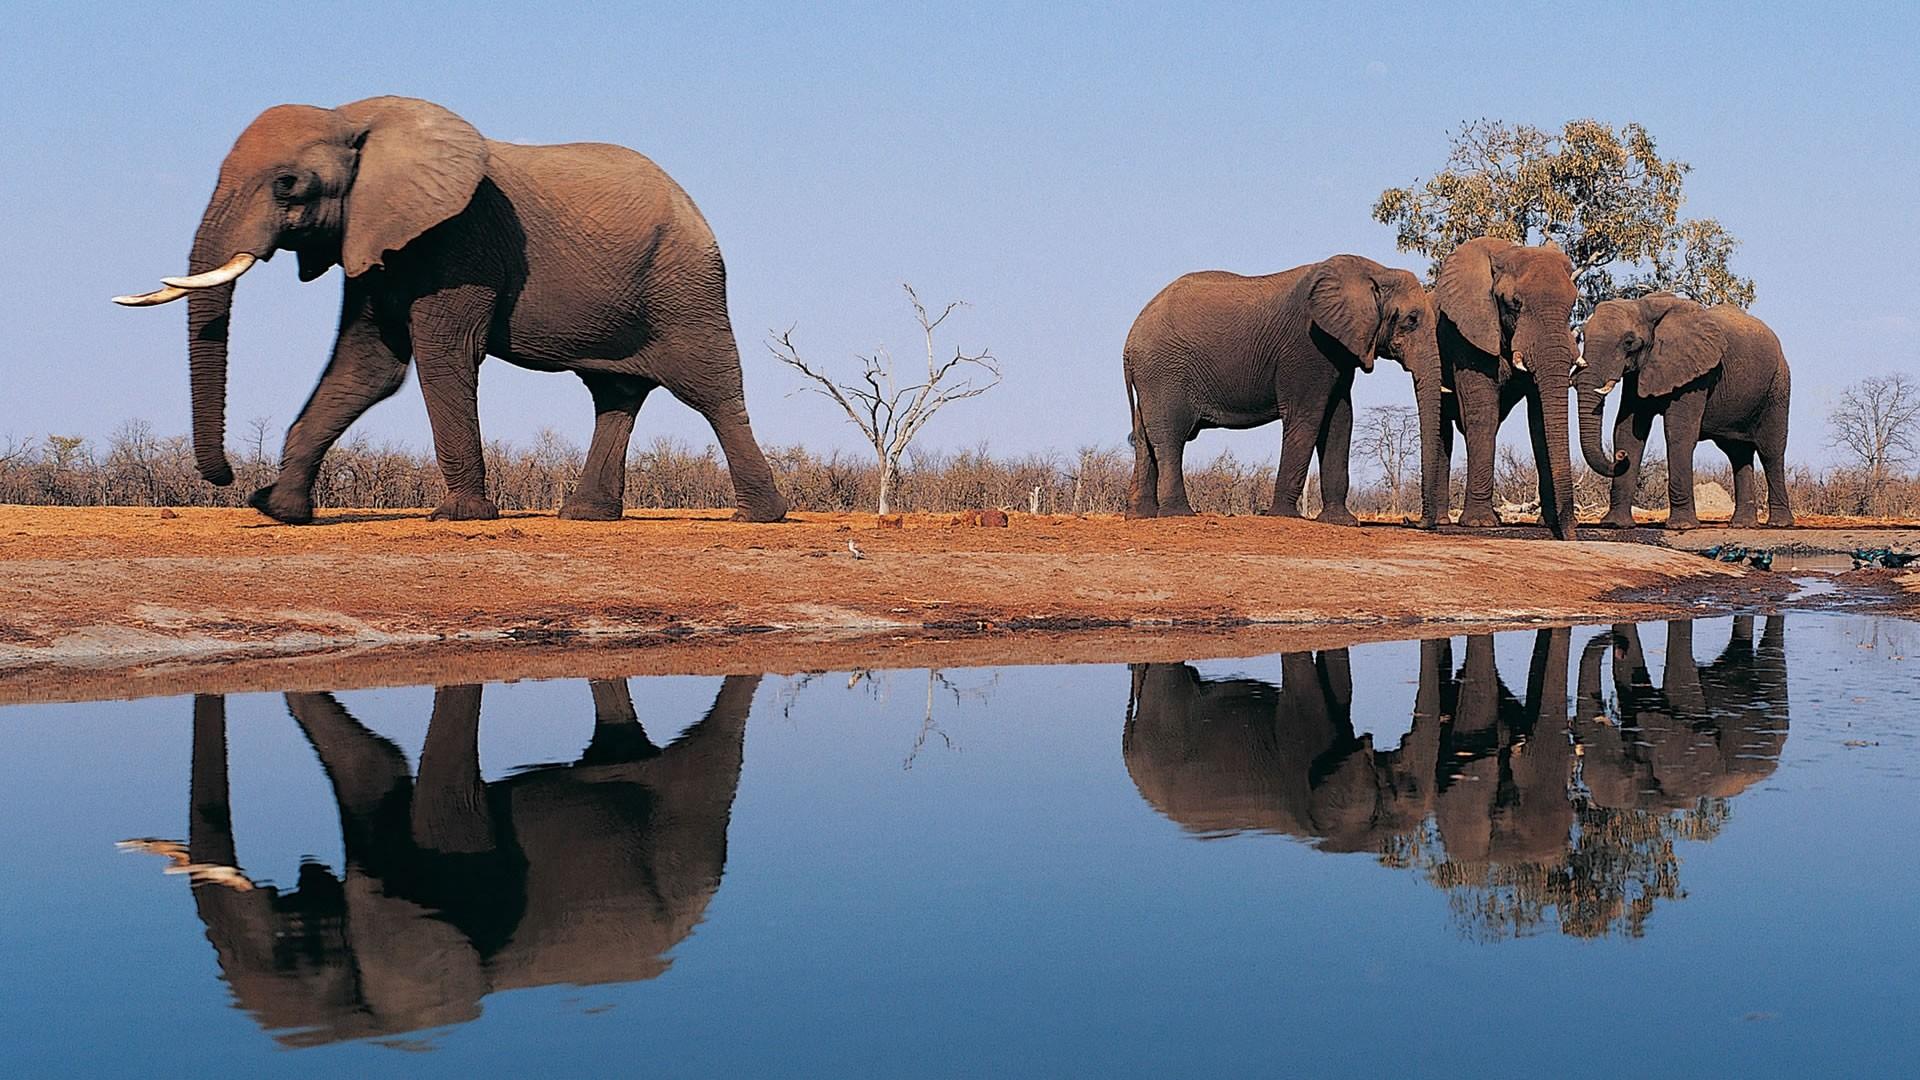 Res: 1920x1080, Elephants Animals HD Desktop Wallpaper